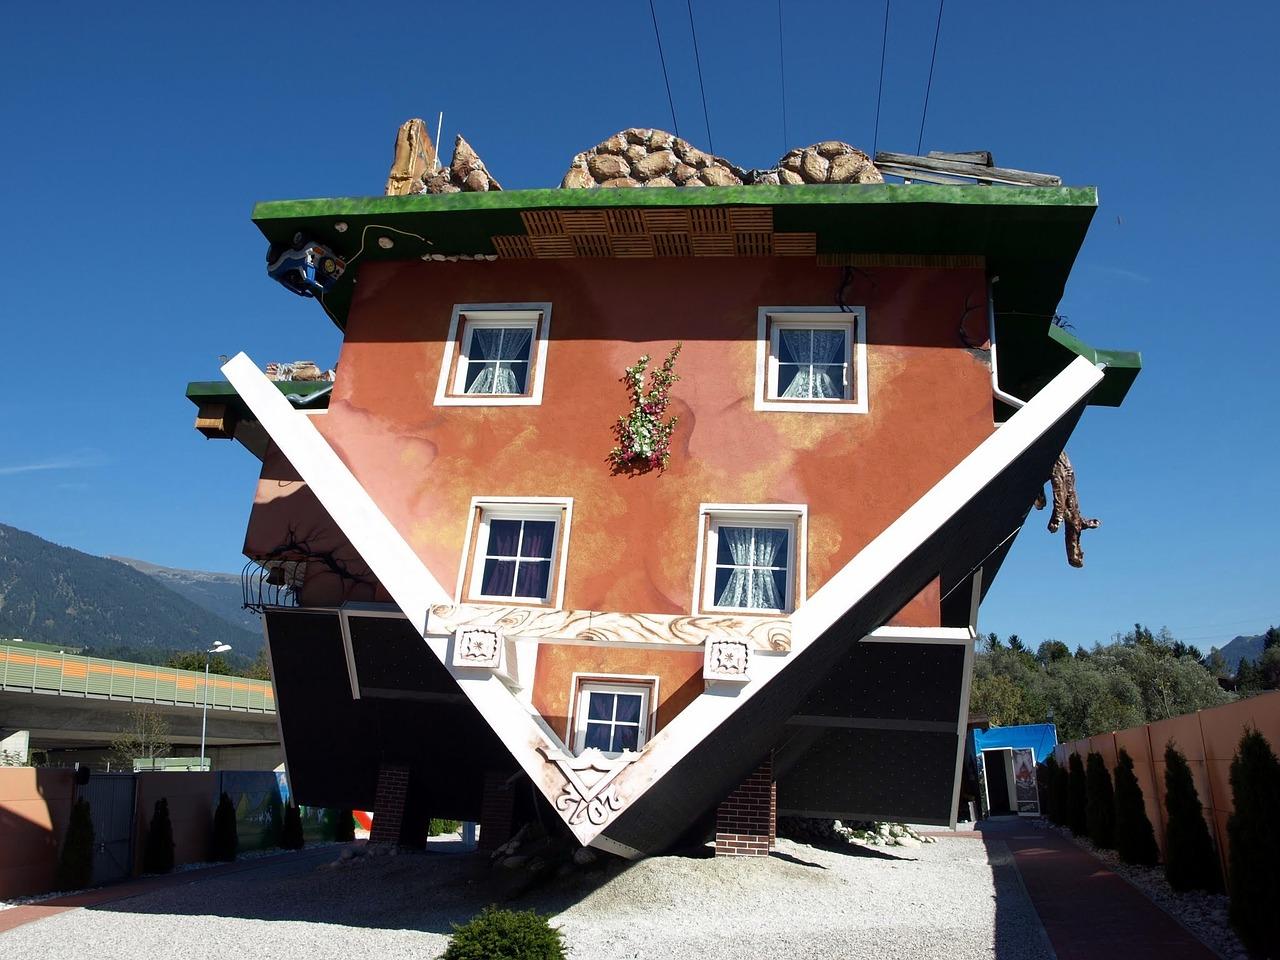 Upside-down house